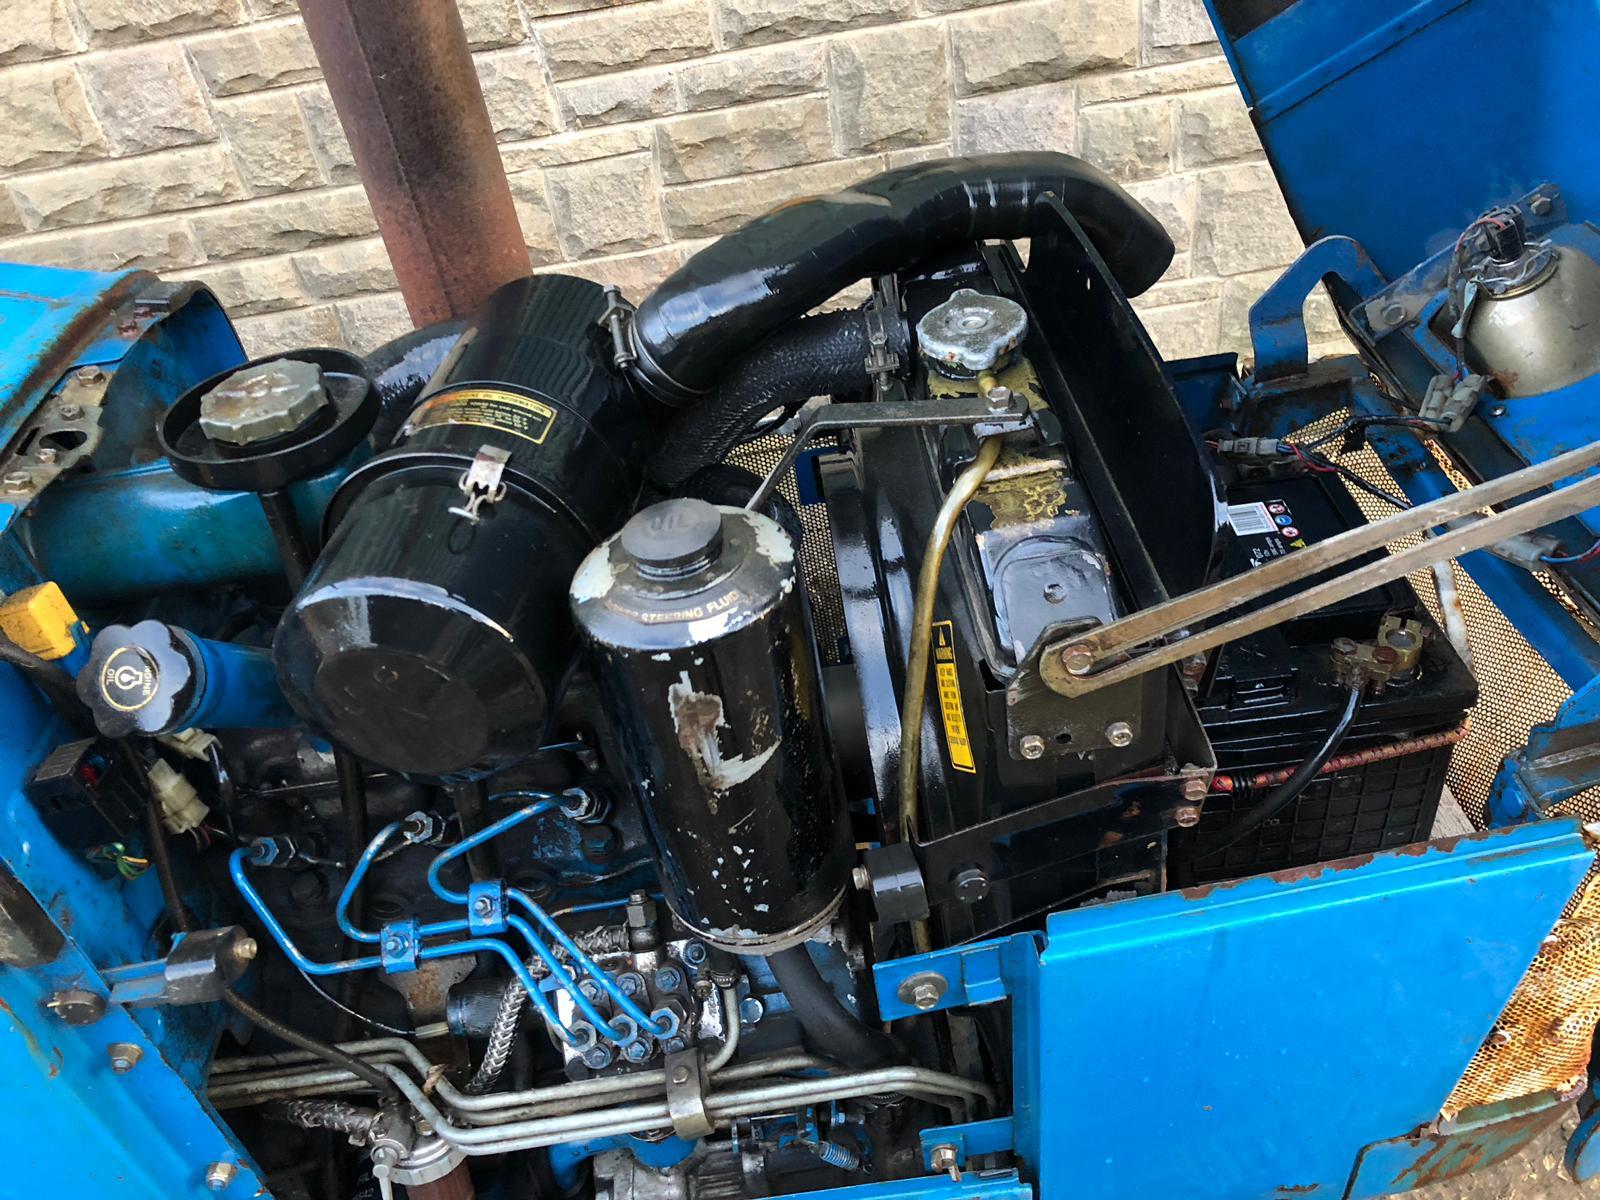 Lot 220 - 1994/M REG FORD NEW HOLLAND 1520 BLUE DIESEL COMPACT DIESEL TRACTOR *PLUS VAT*